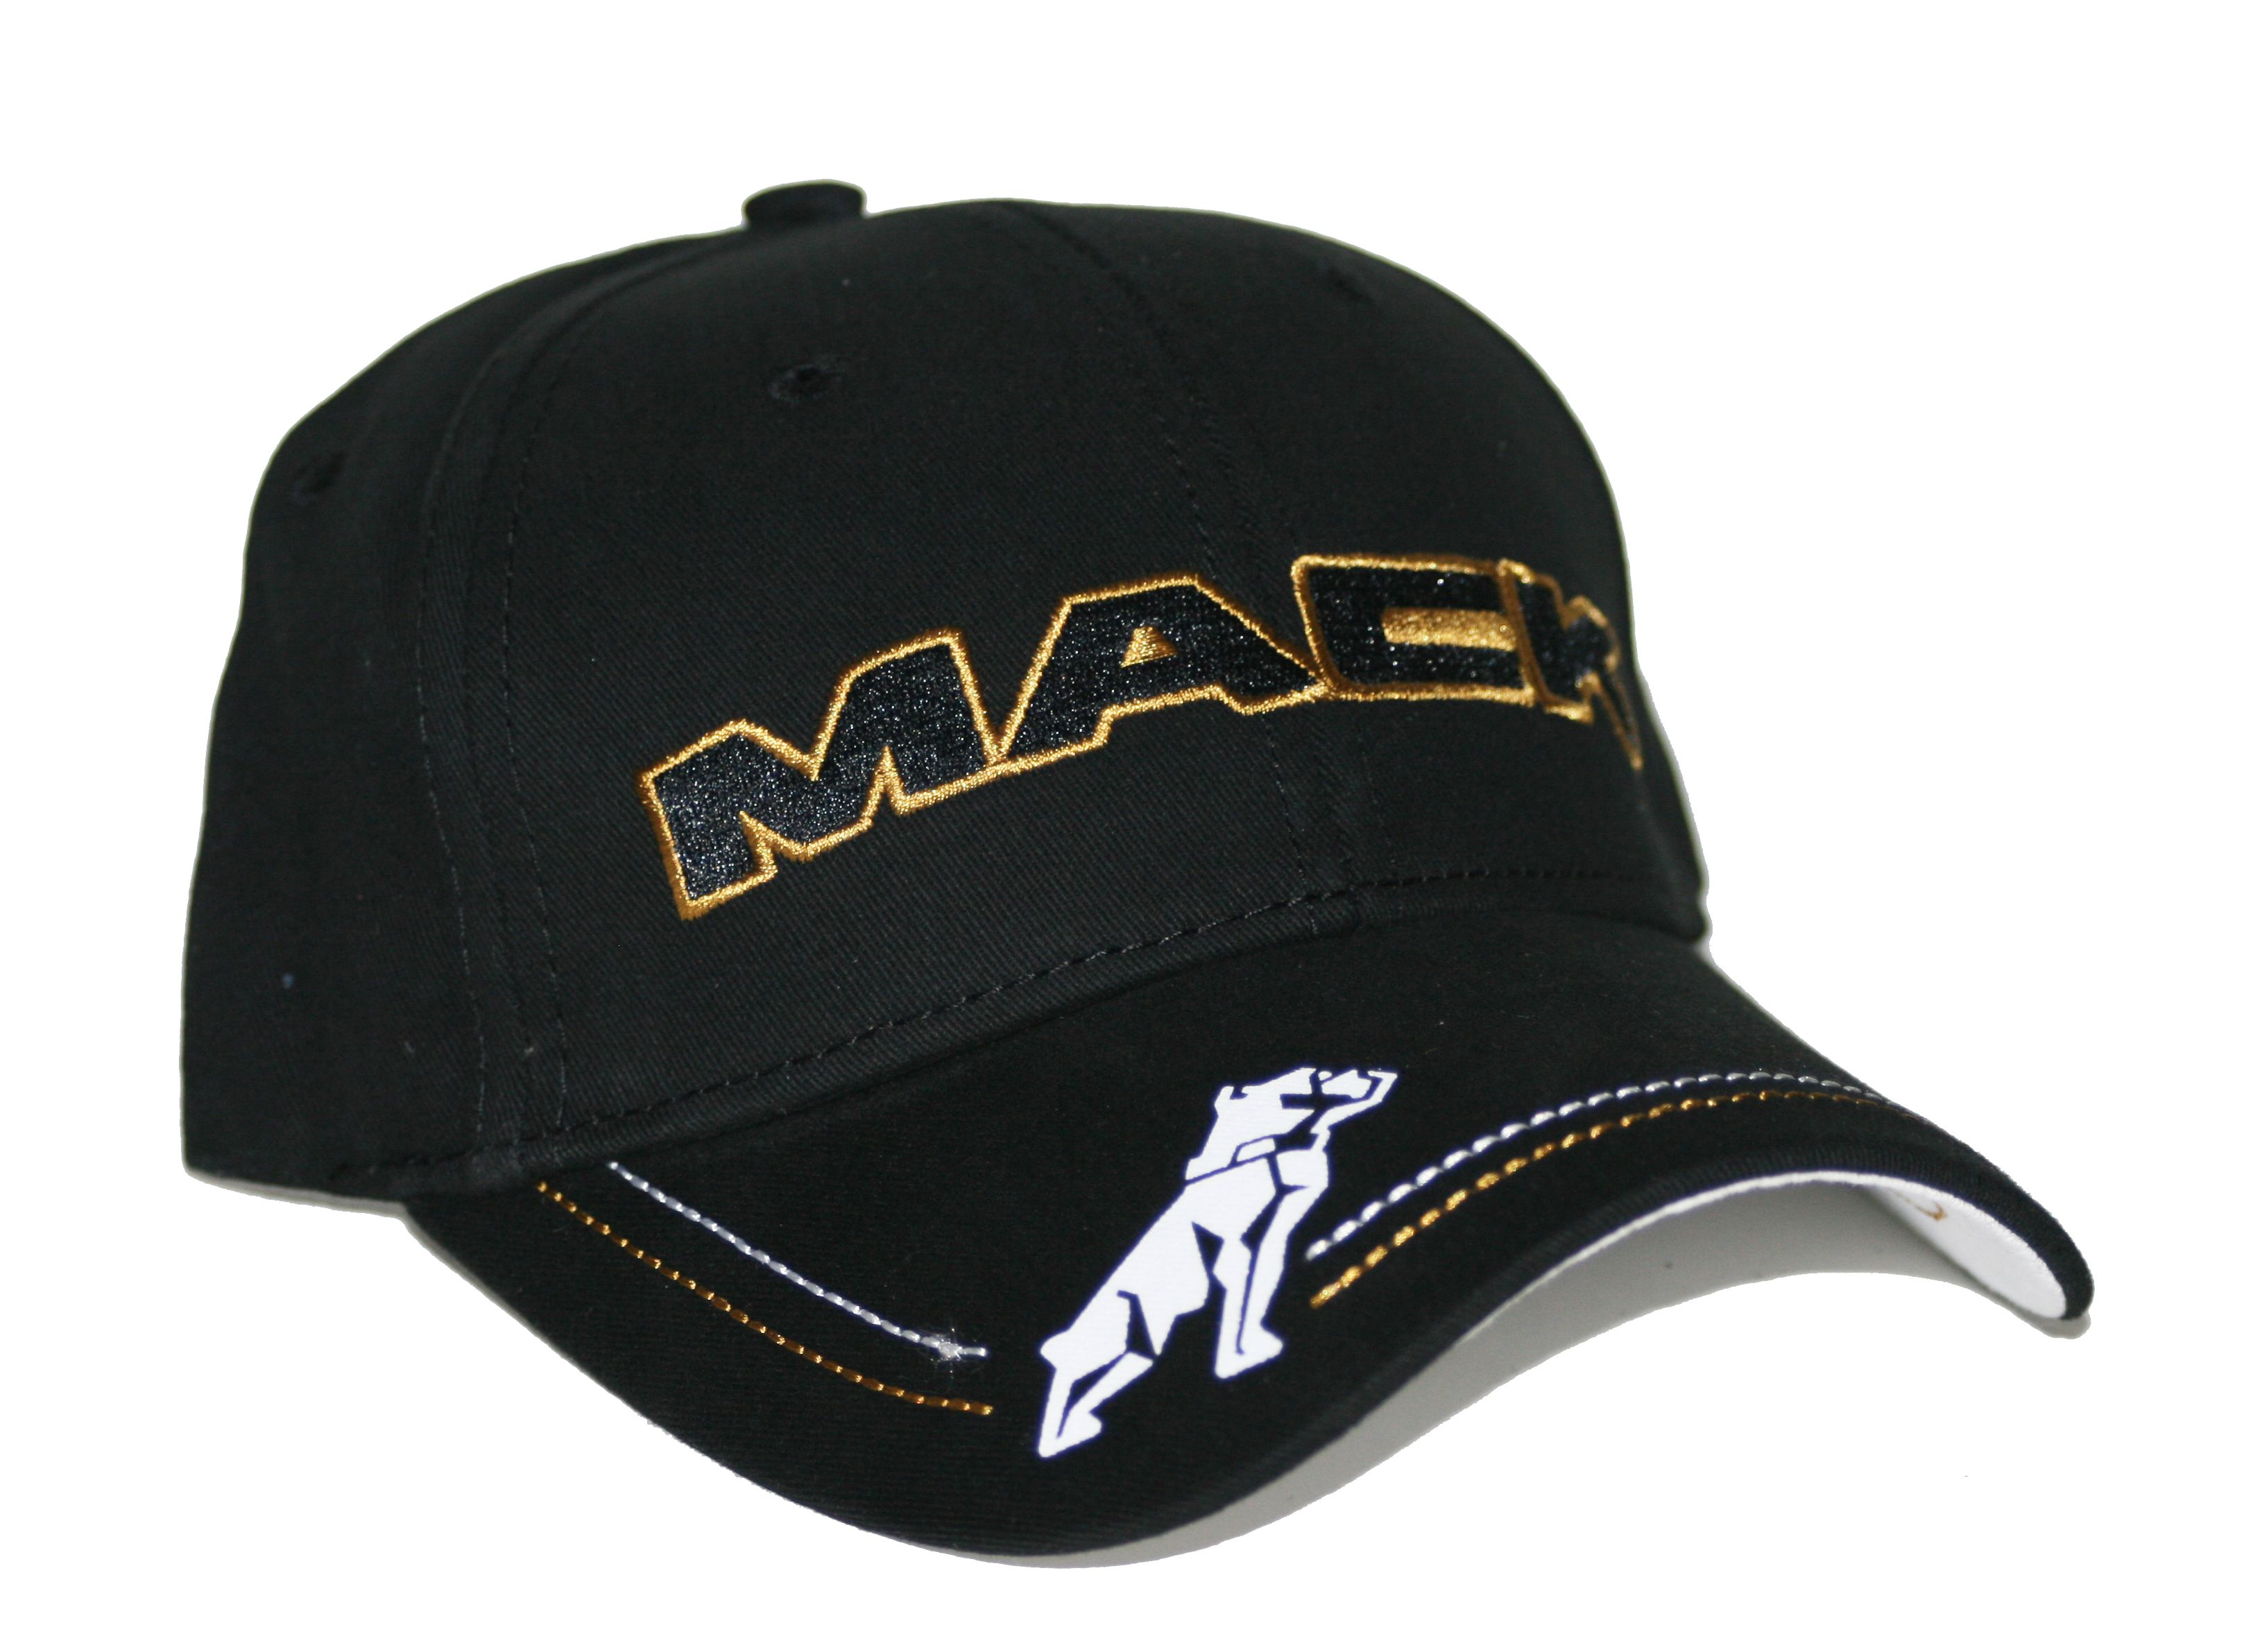 73254ad22772b Mack Truck Merchandise - Mack Truck Hats - Mack Trucks Black Bulldog Logo  Snapback Cap - Mack Trucks Black Bulldog Logo Snapback Caps